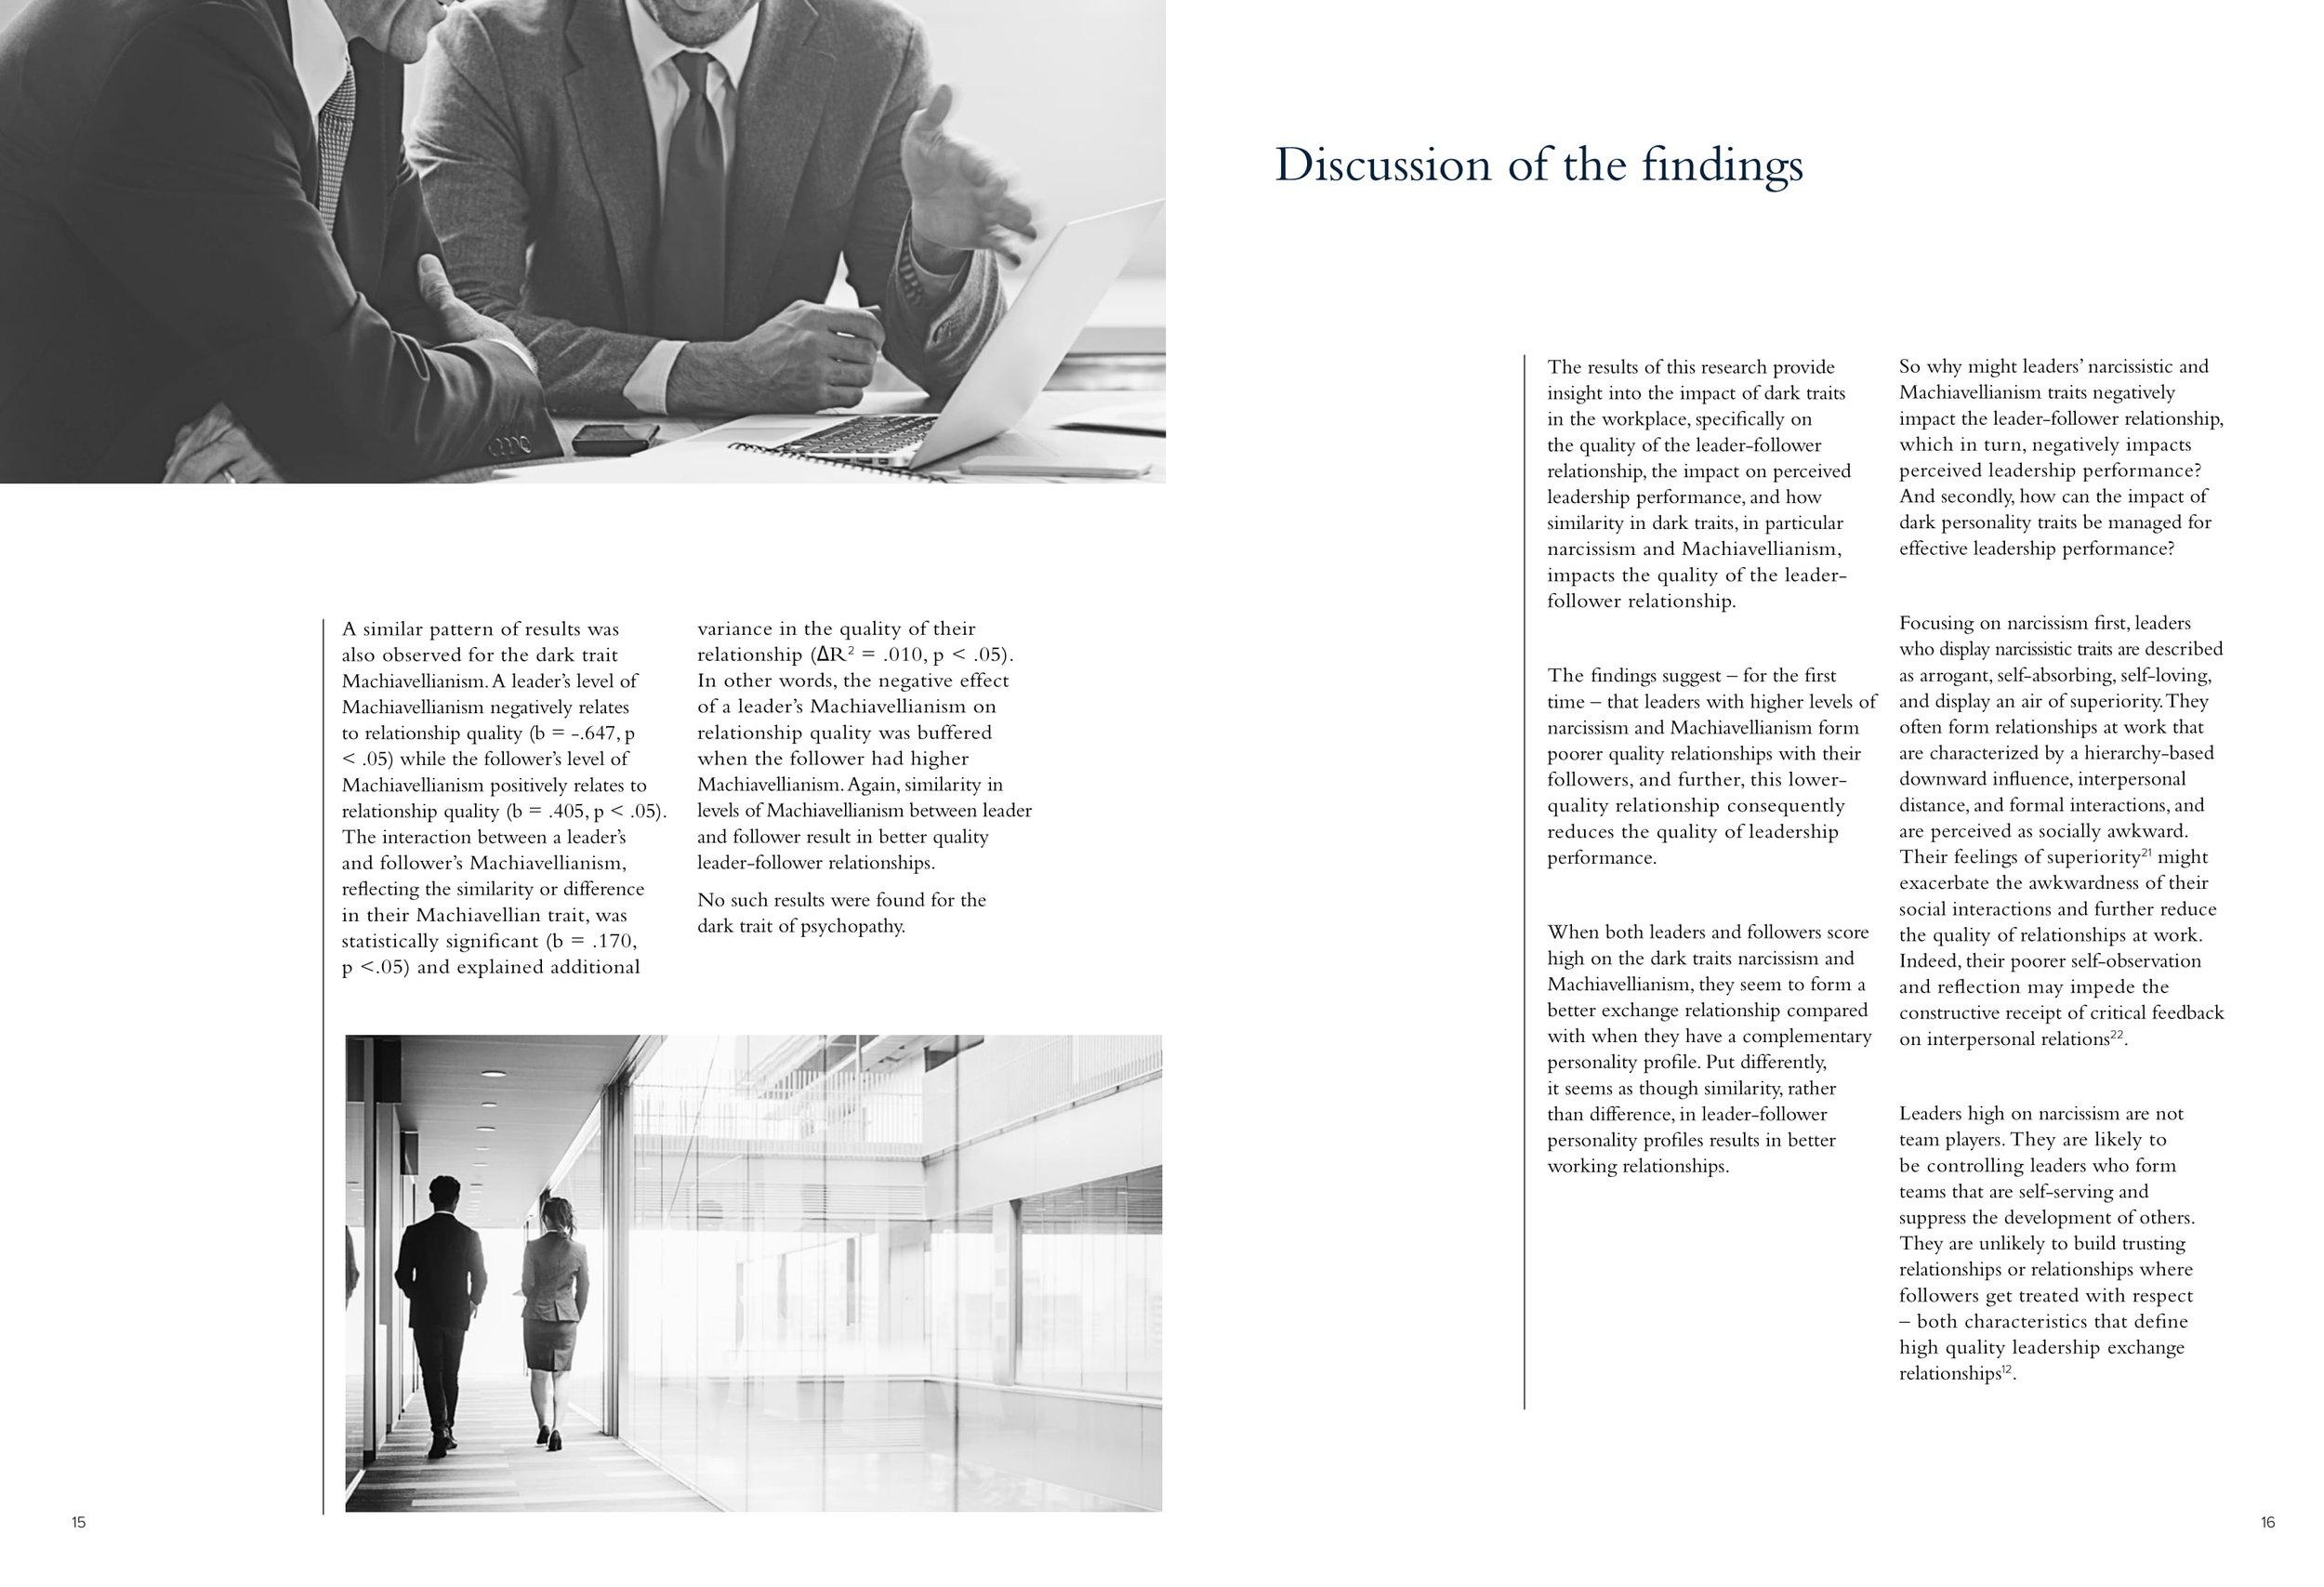 Ashridge-Hult-The-bright-side-of-dark-leadership-09.jpg